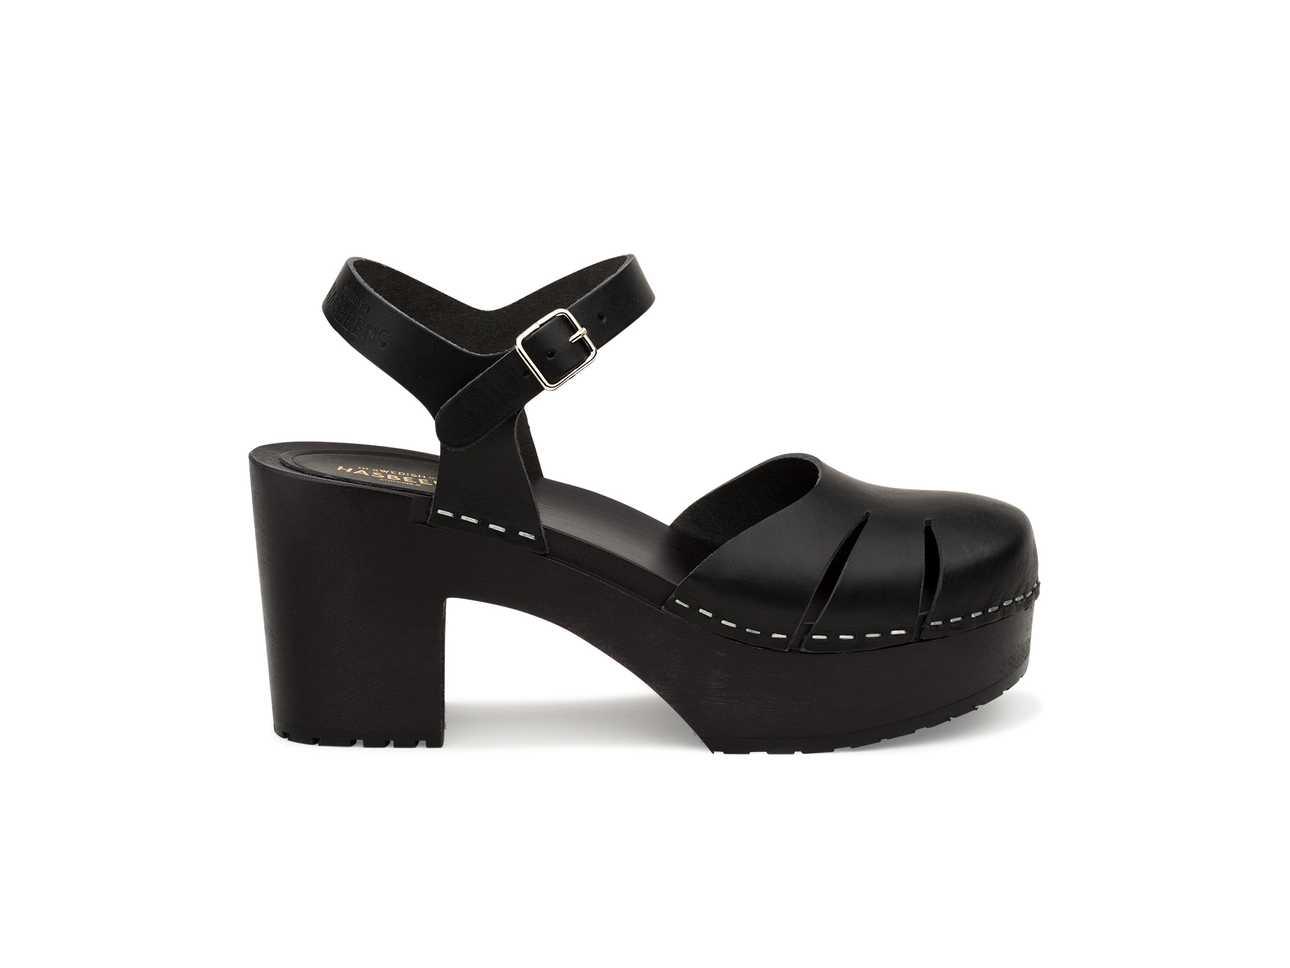 Baskemölla Sandal Black/black Sole